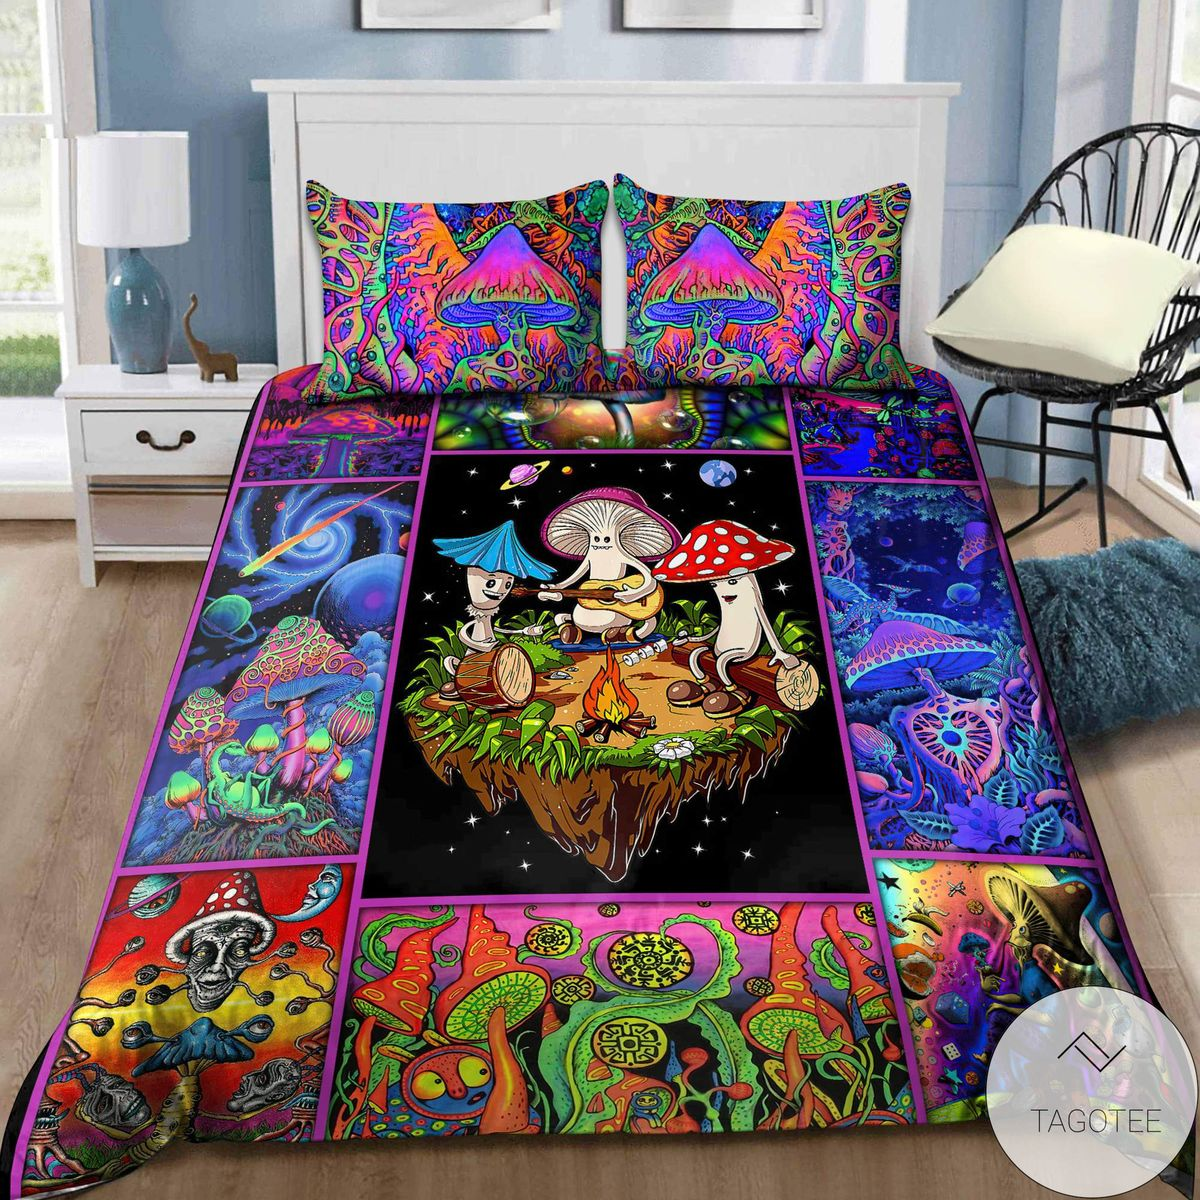 Colorful Mushroom Hippie Bedding Setc